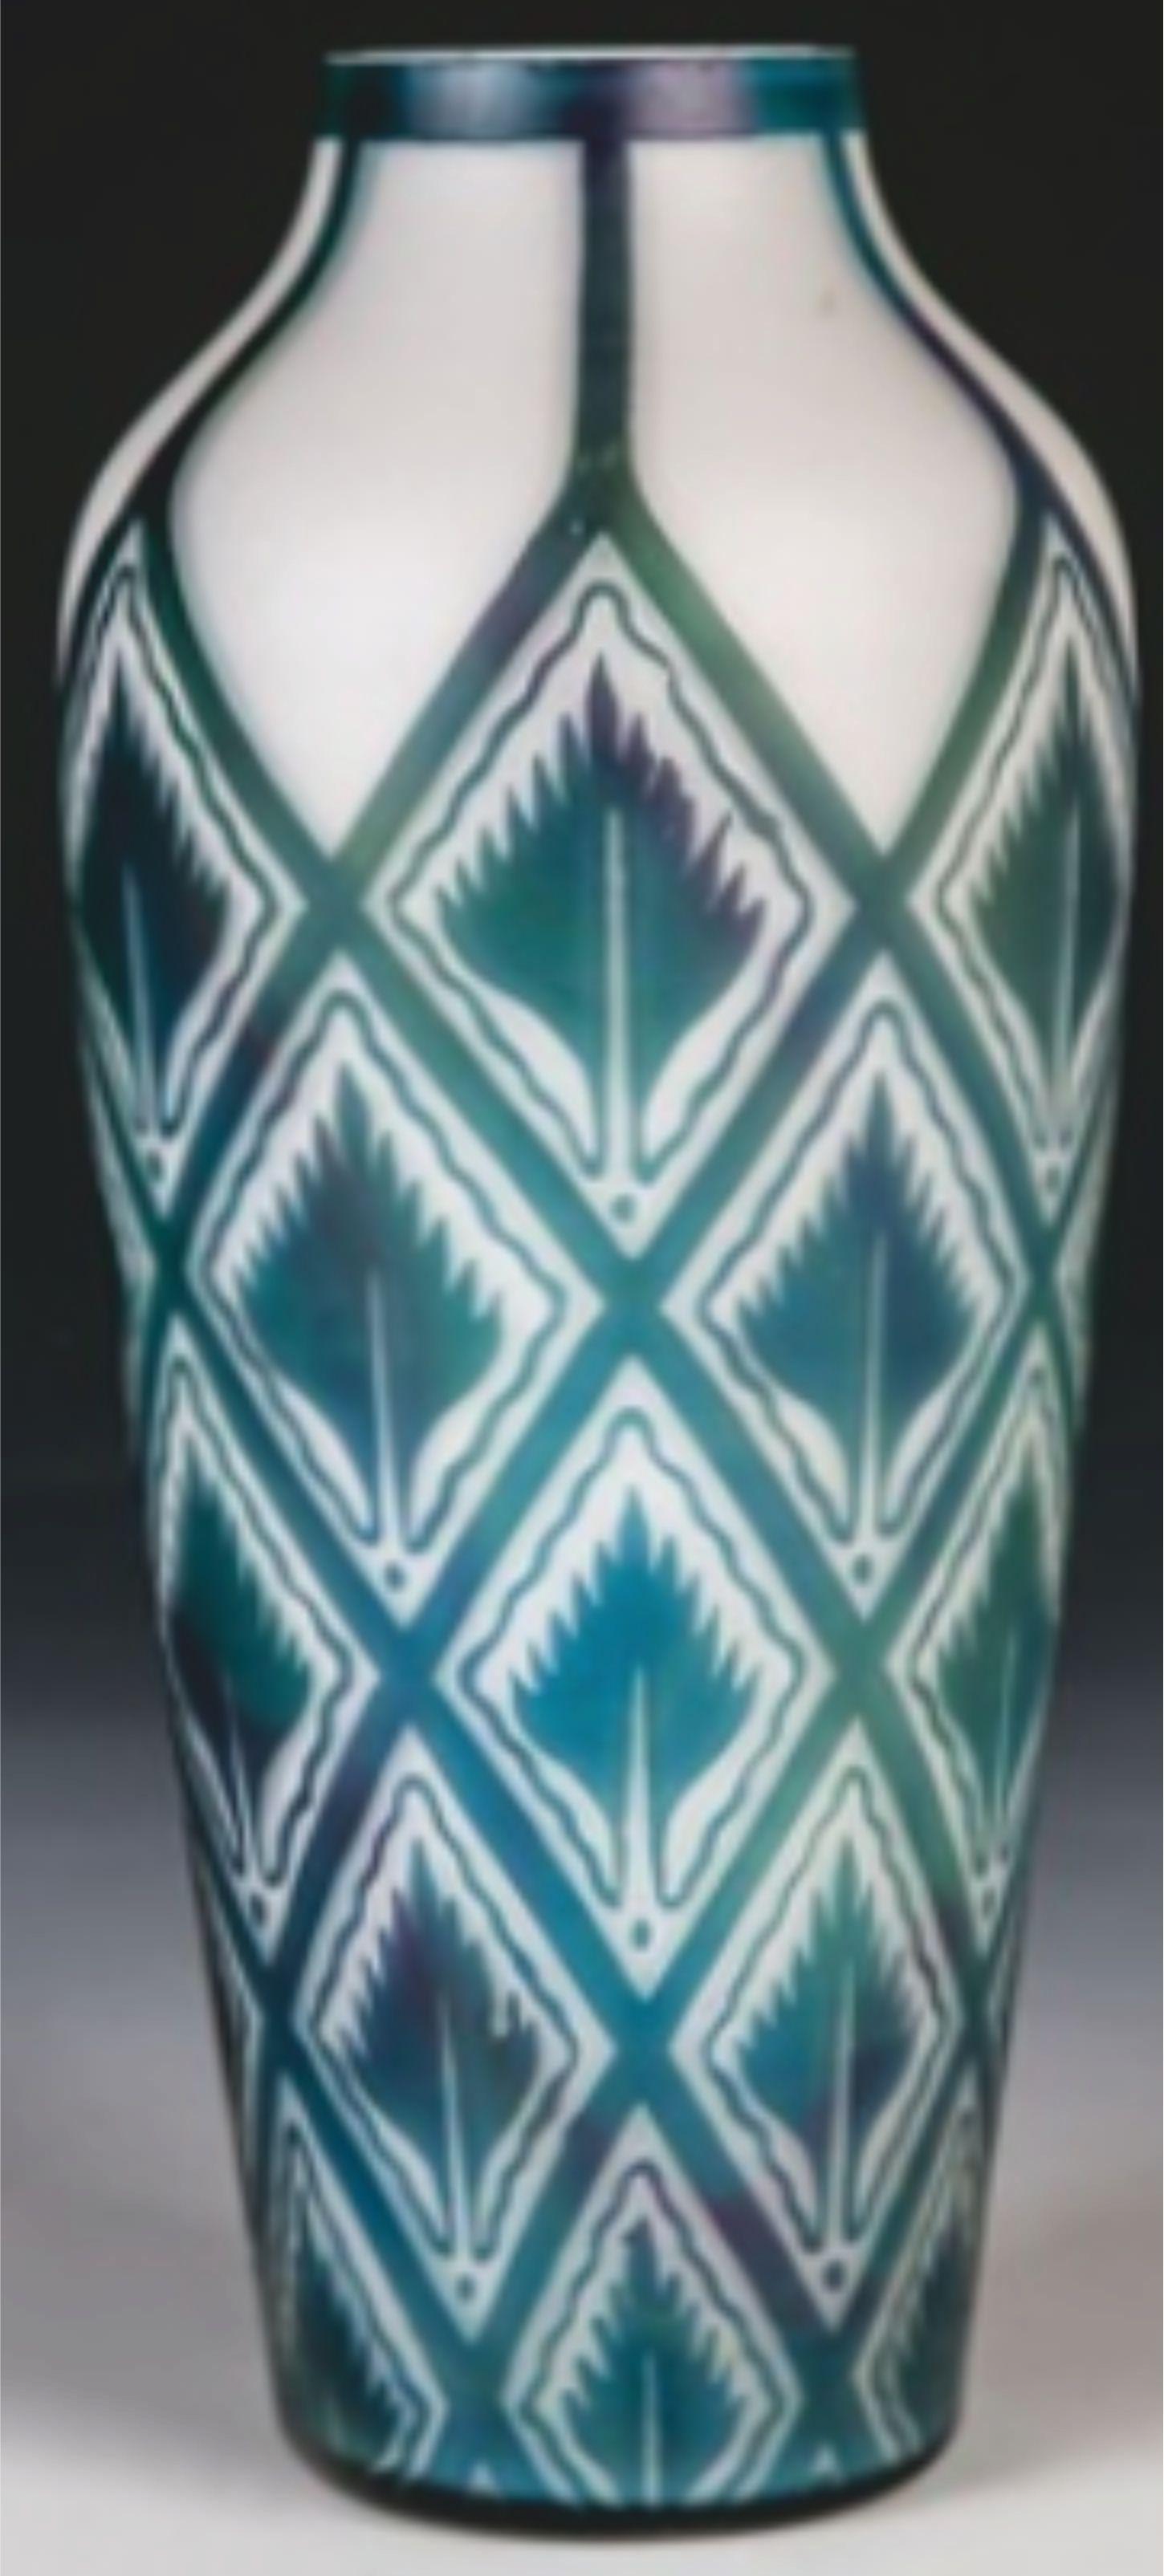 Künstler Beckmann Weis Titel Vase Medium Glass Größe 26 Cm 10 2 In Art Nouveau Pottery Art Deco